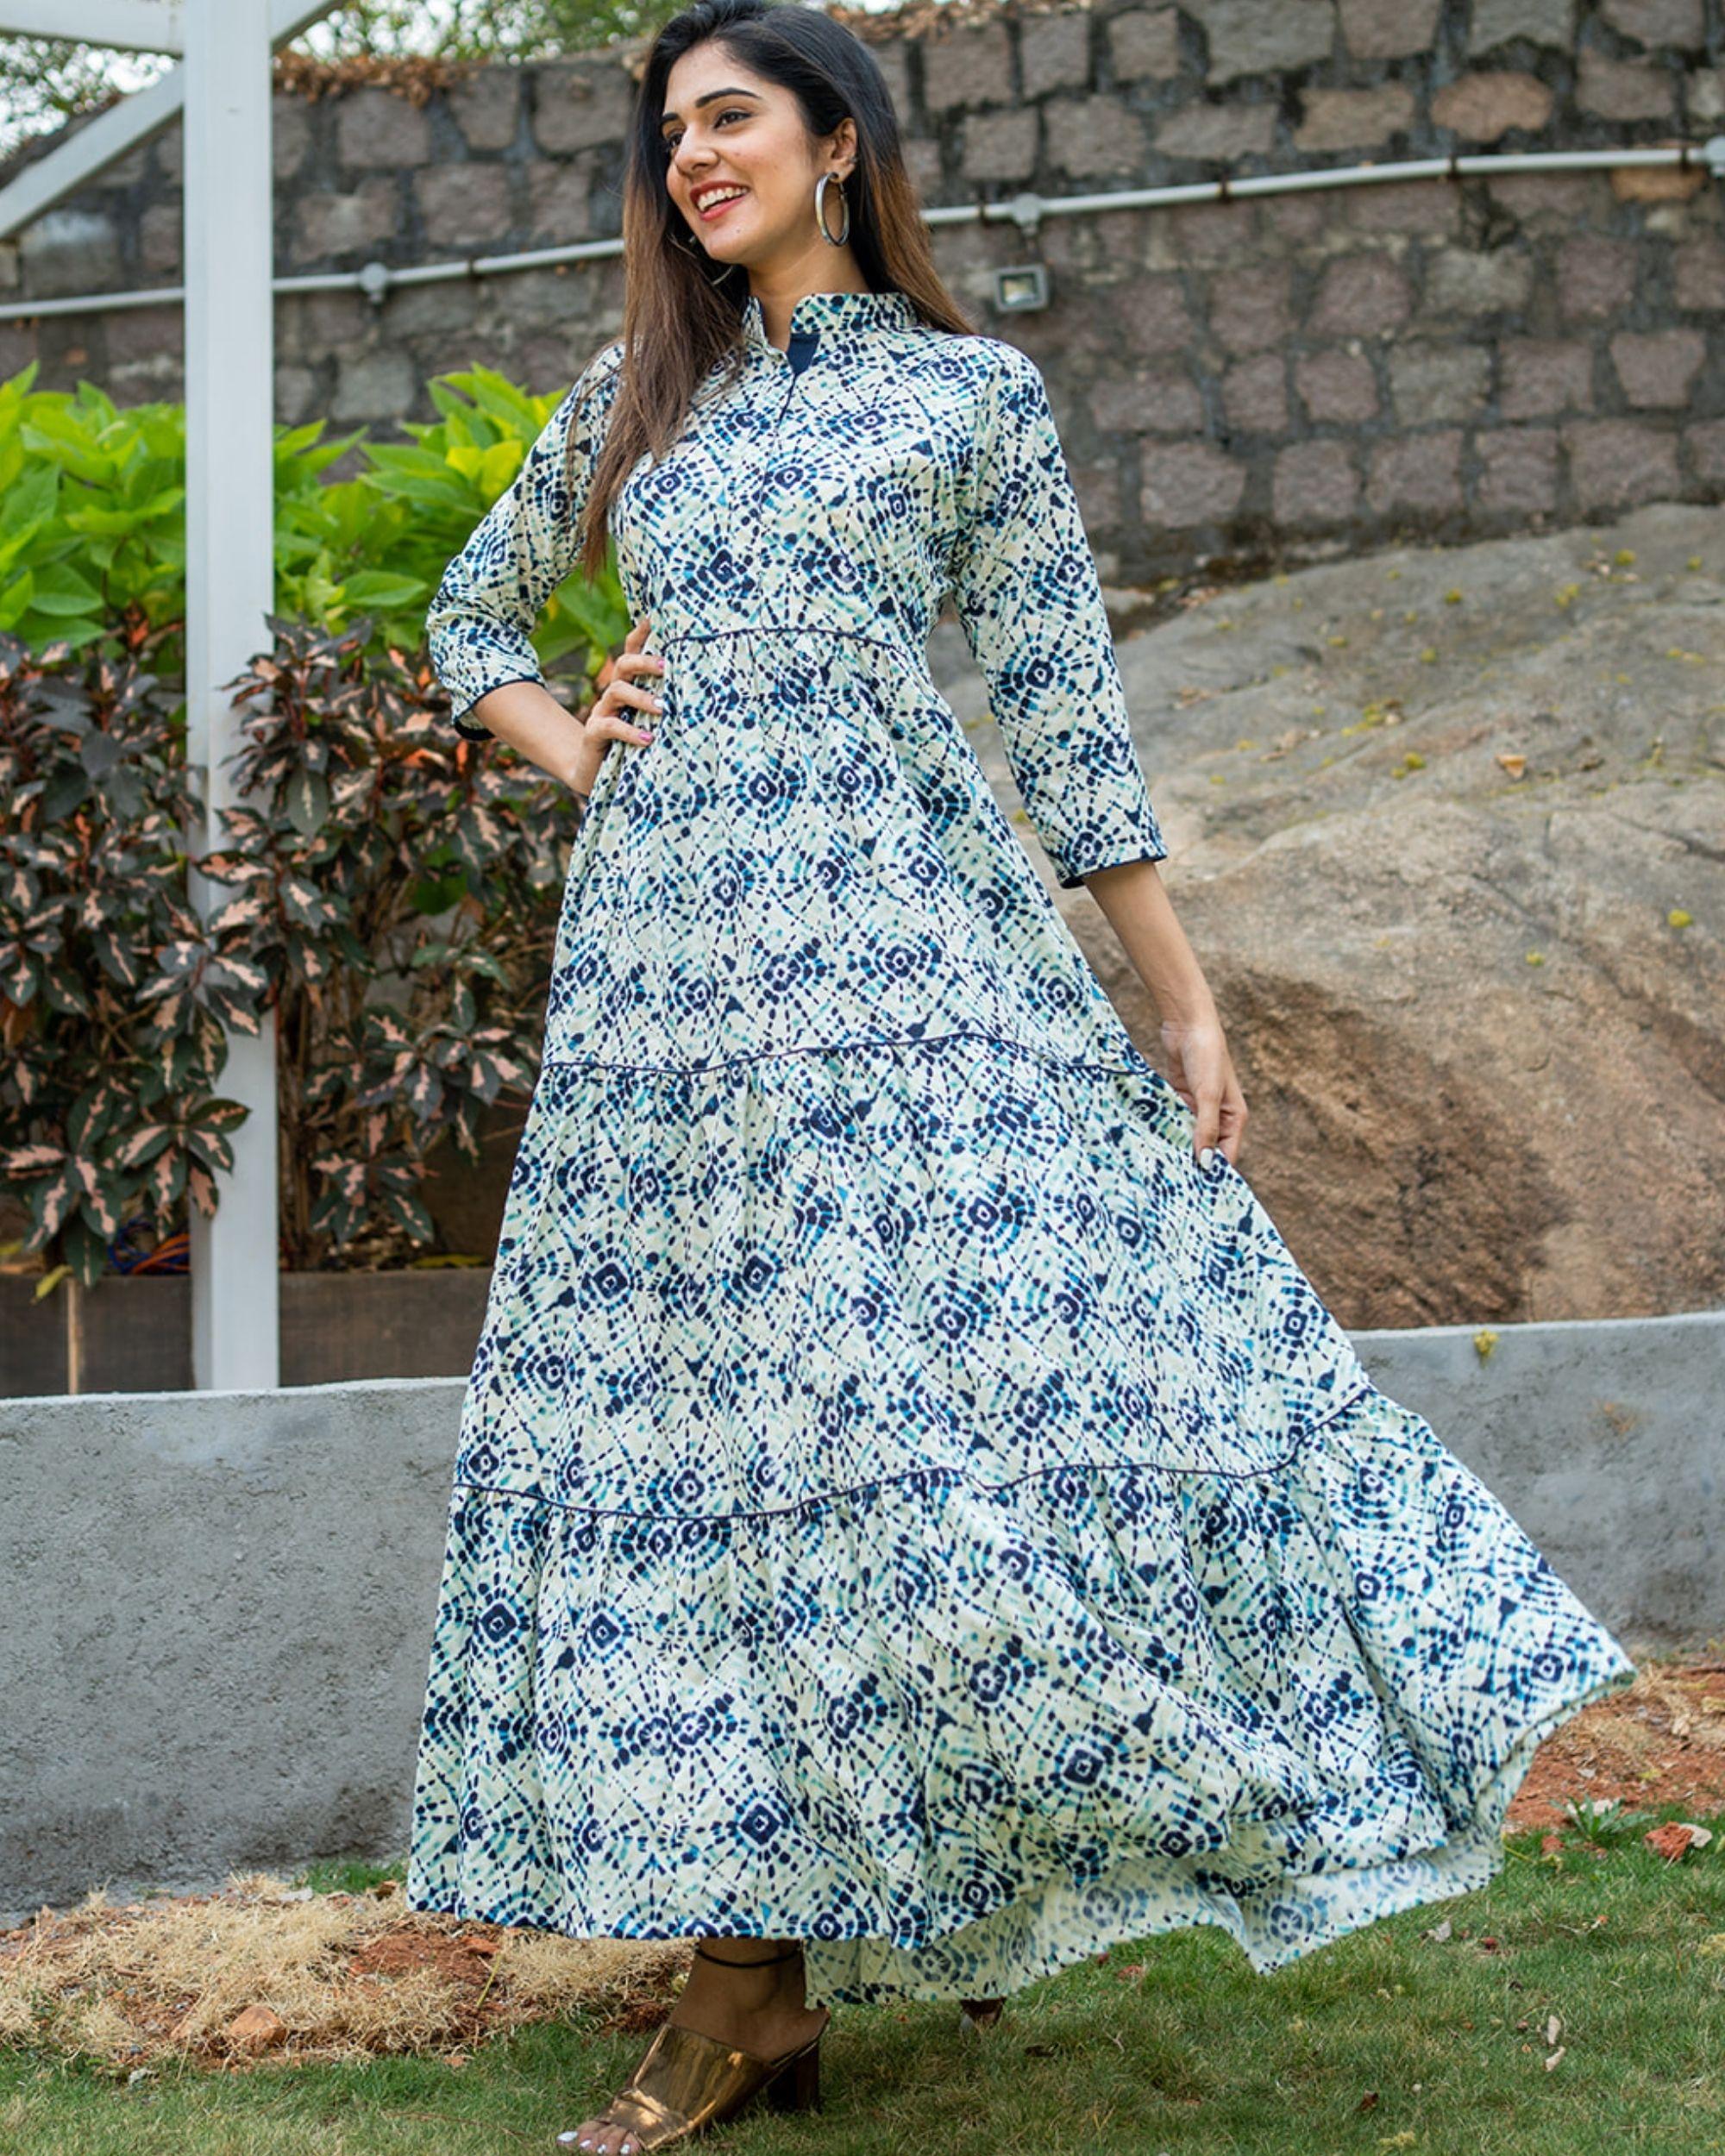 Blue tie dye layered dress